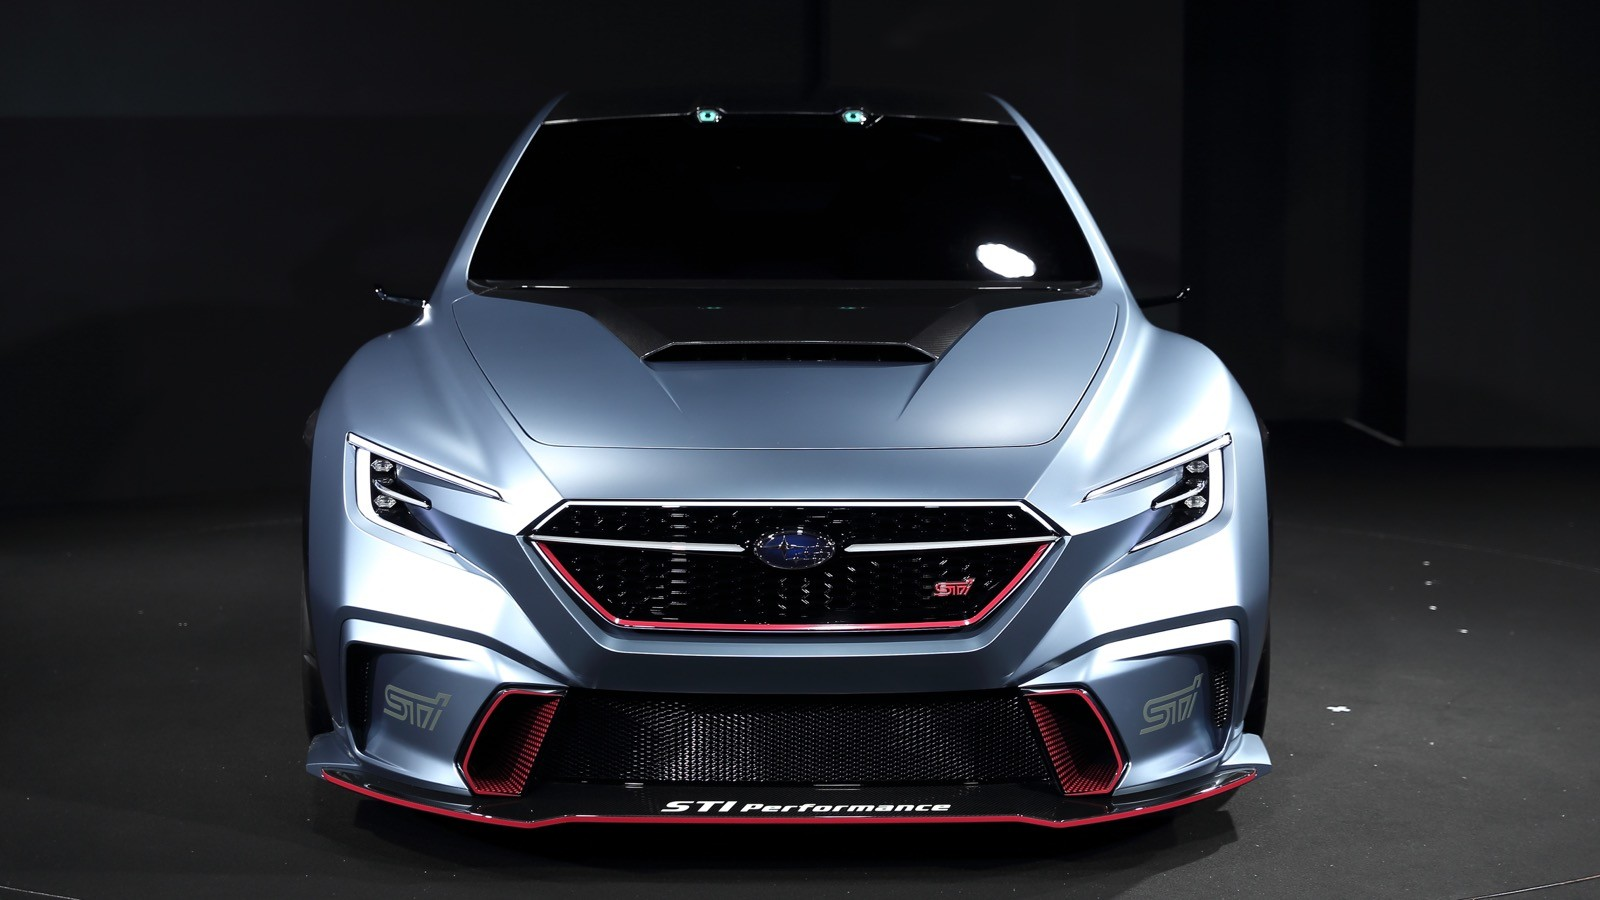 Subaru Boxer Engine >> 2022 Subaru WRX STI Expected With FA24 2.4-Liter Turbo Boxer Engine, 400 HP - autoevolution